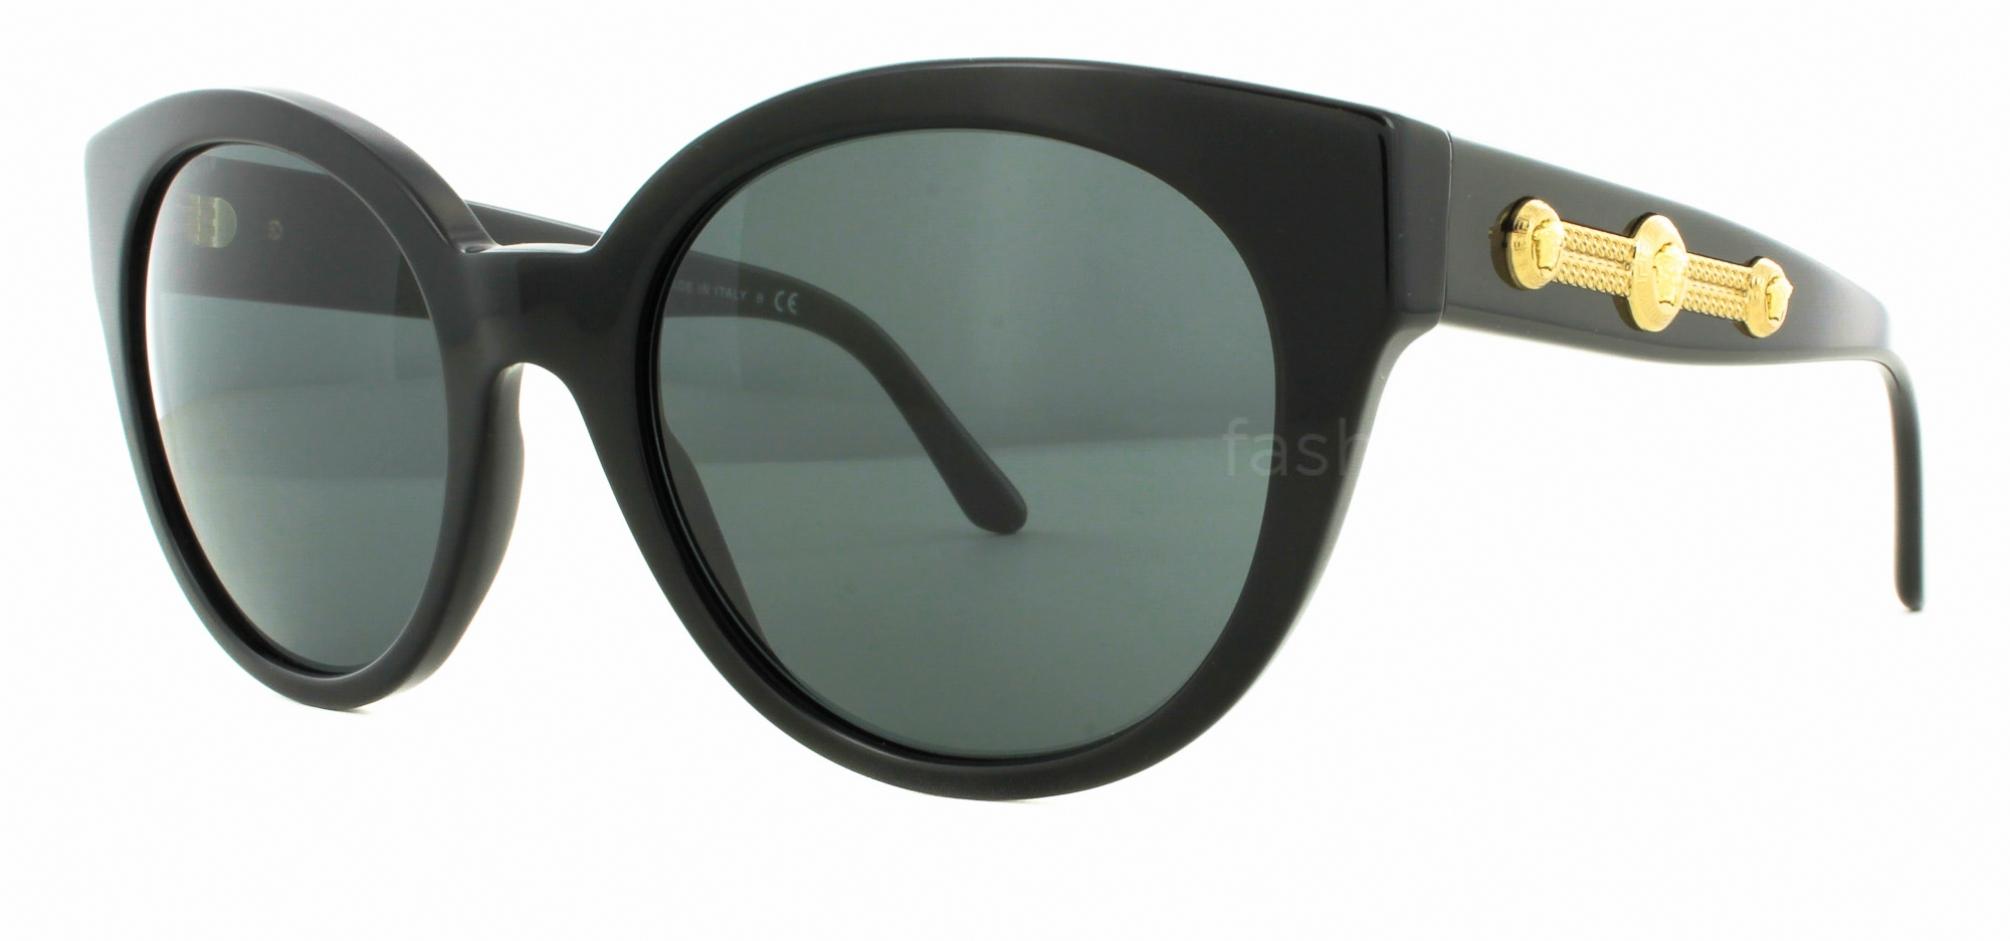 Discount Designer Eyeglass Frames A31s